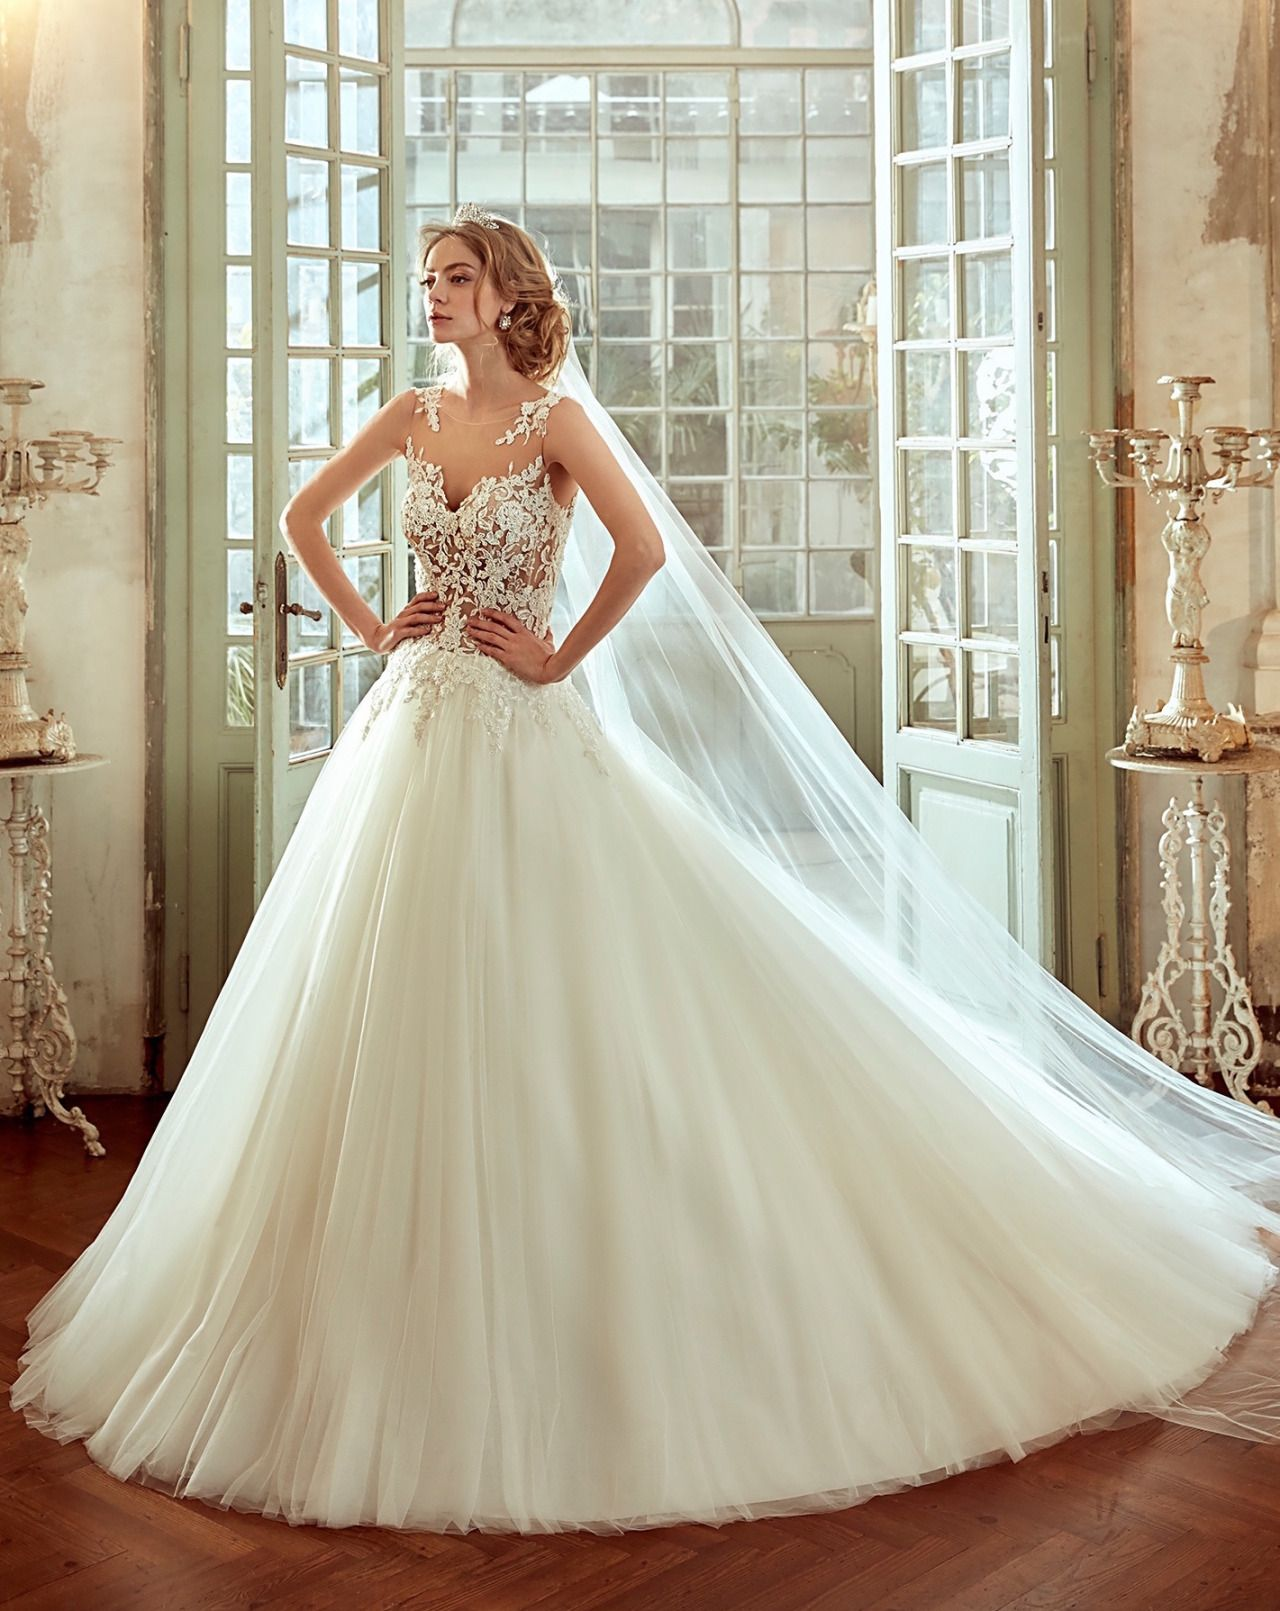 princess wedding dress | Tumblr | #1 bridal gowns | Pinterest ...